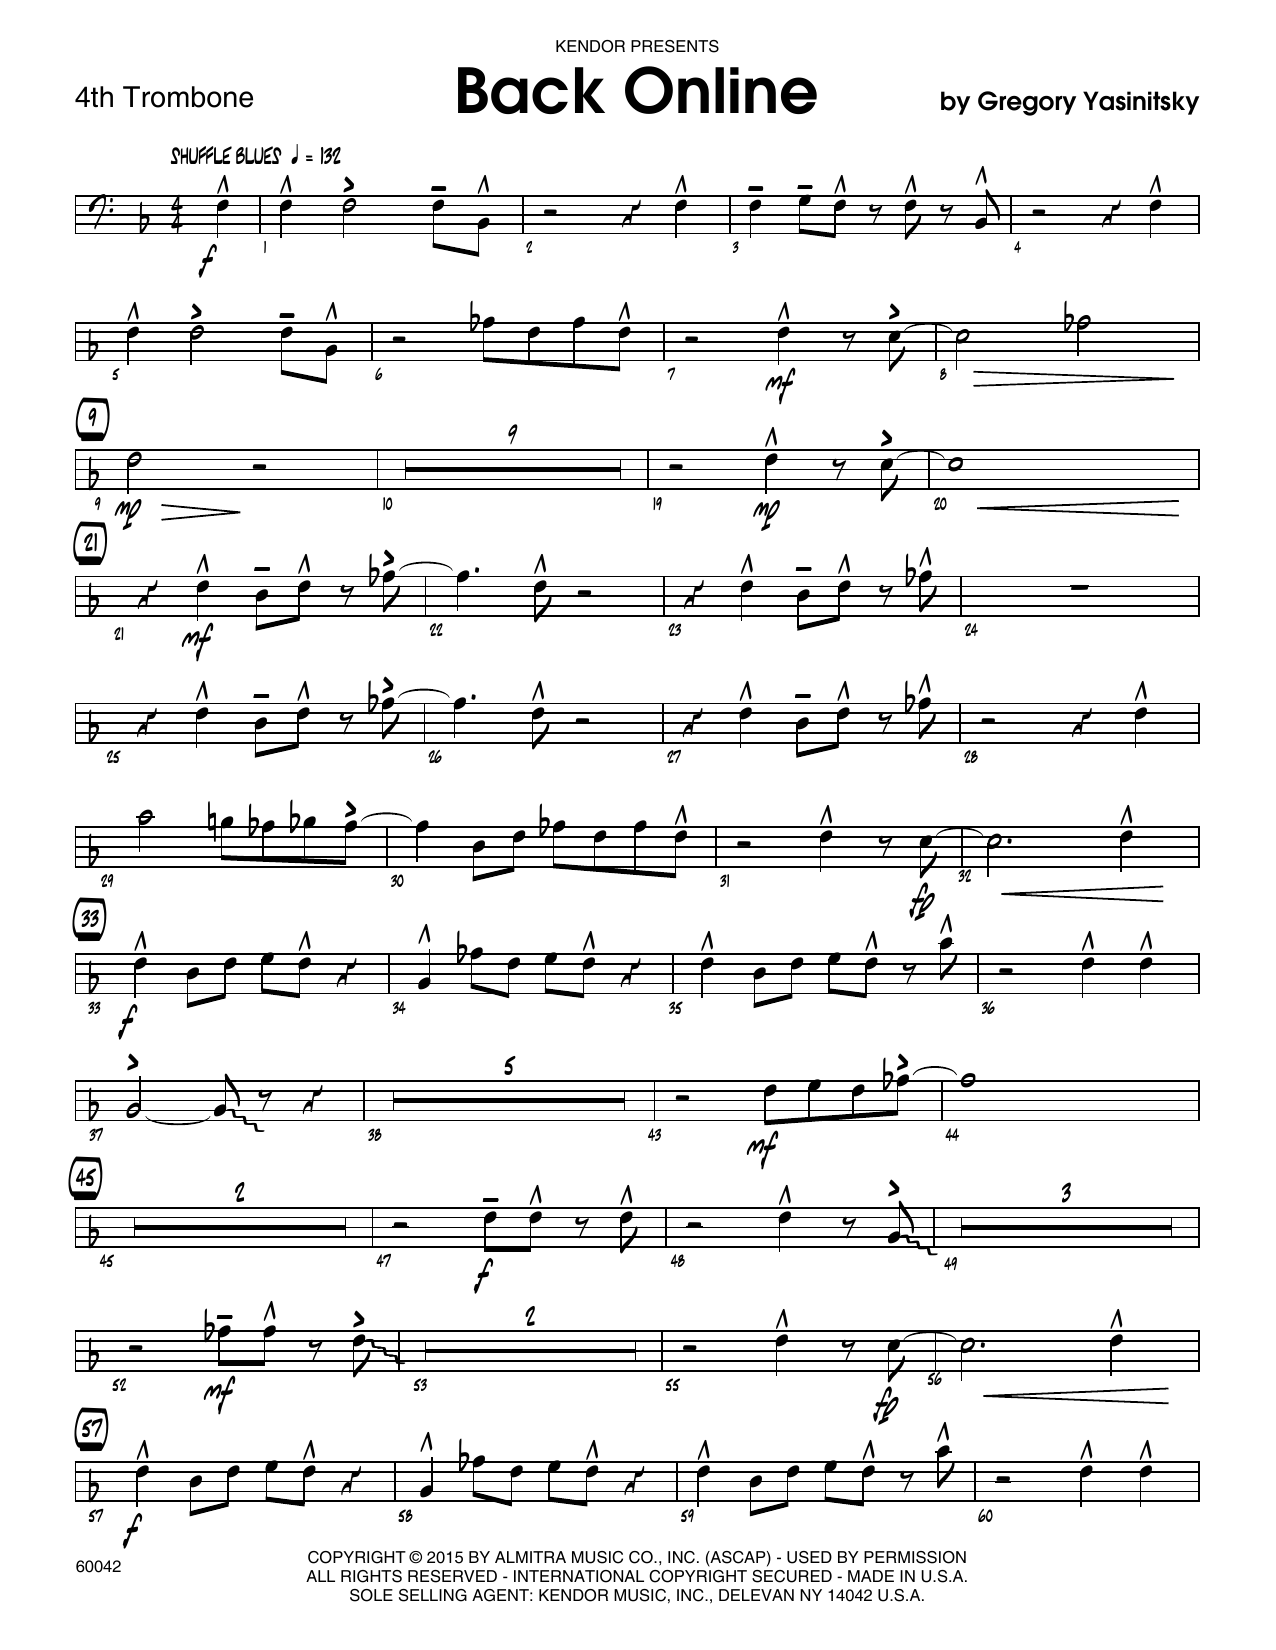 Back Online - 4th Trombone Sheet Music